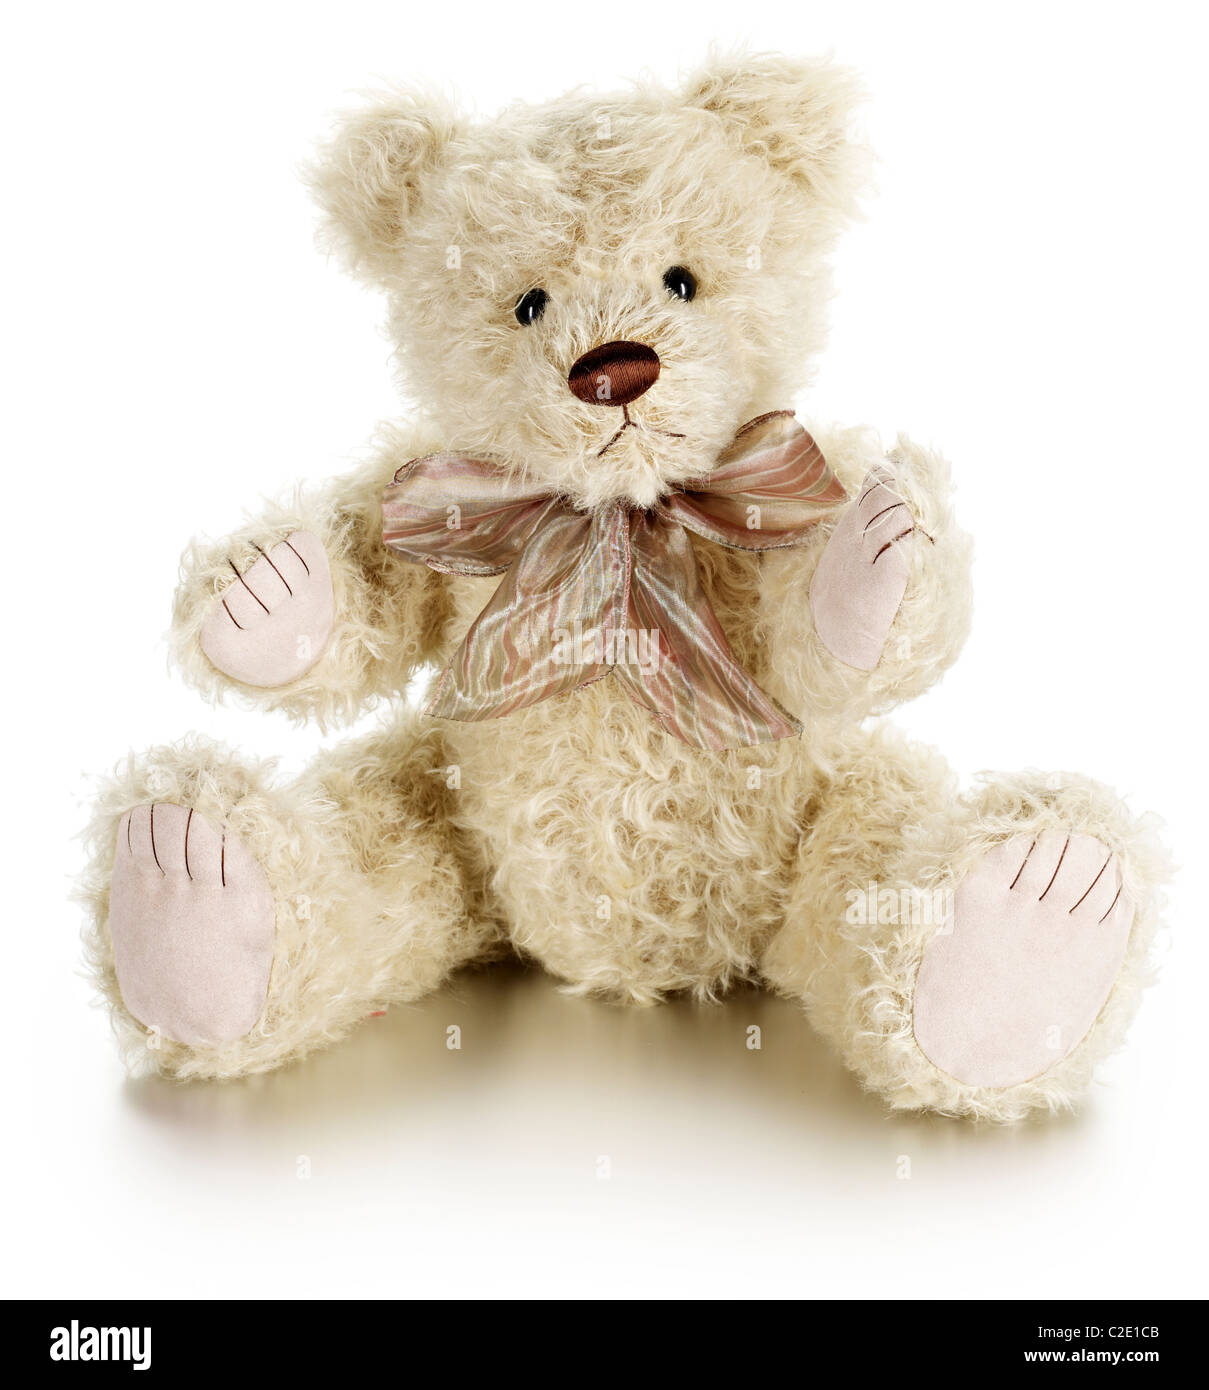 Cute Bear soft toy Photo Stock